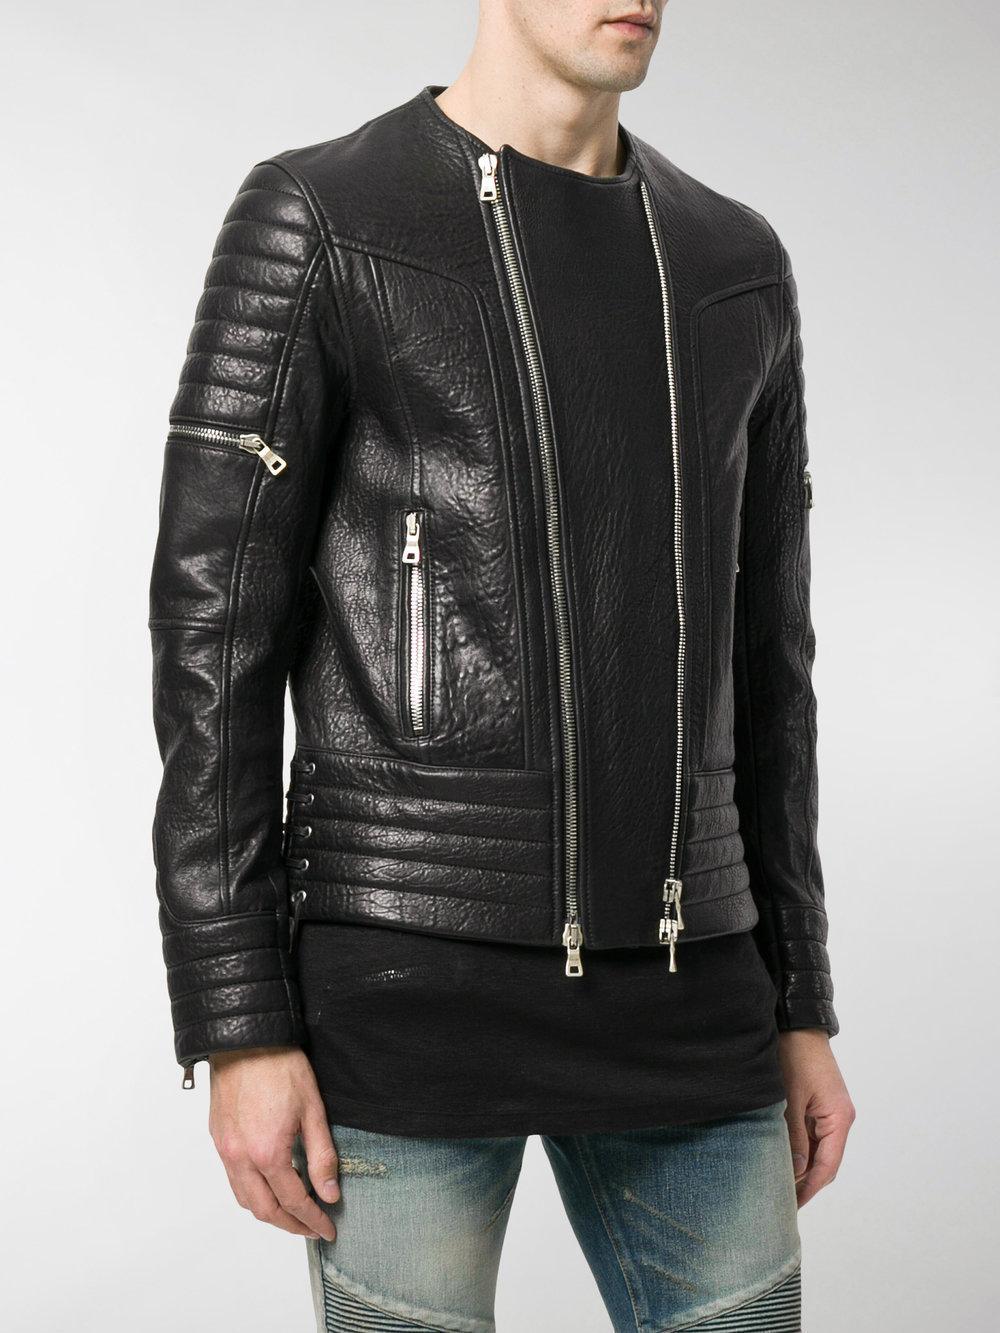 Balmain Cotton Zipped Biker Jacket in Black for Men